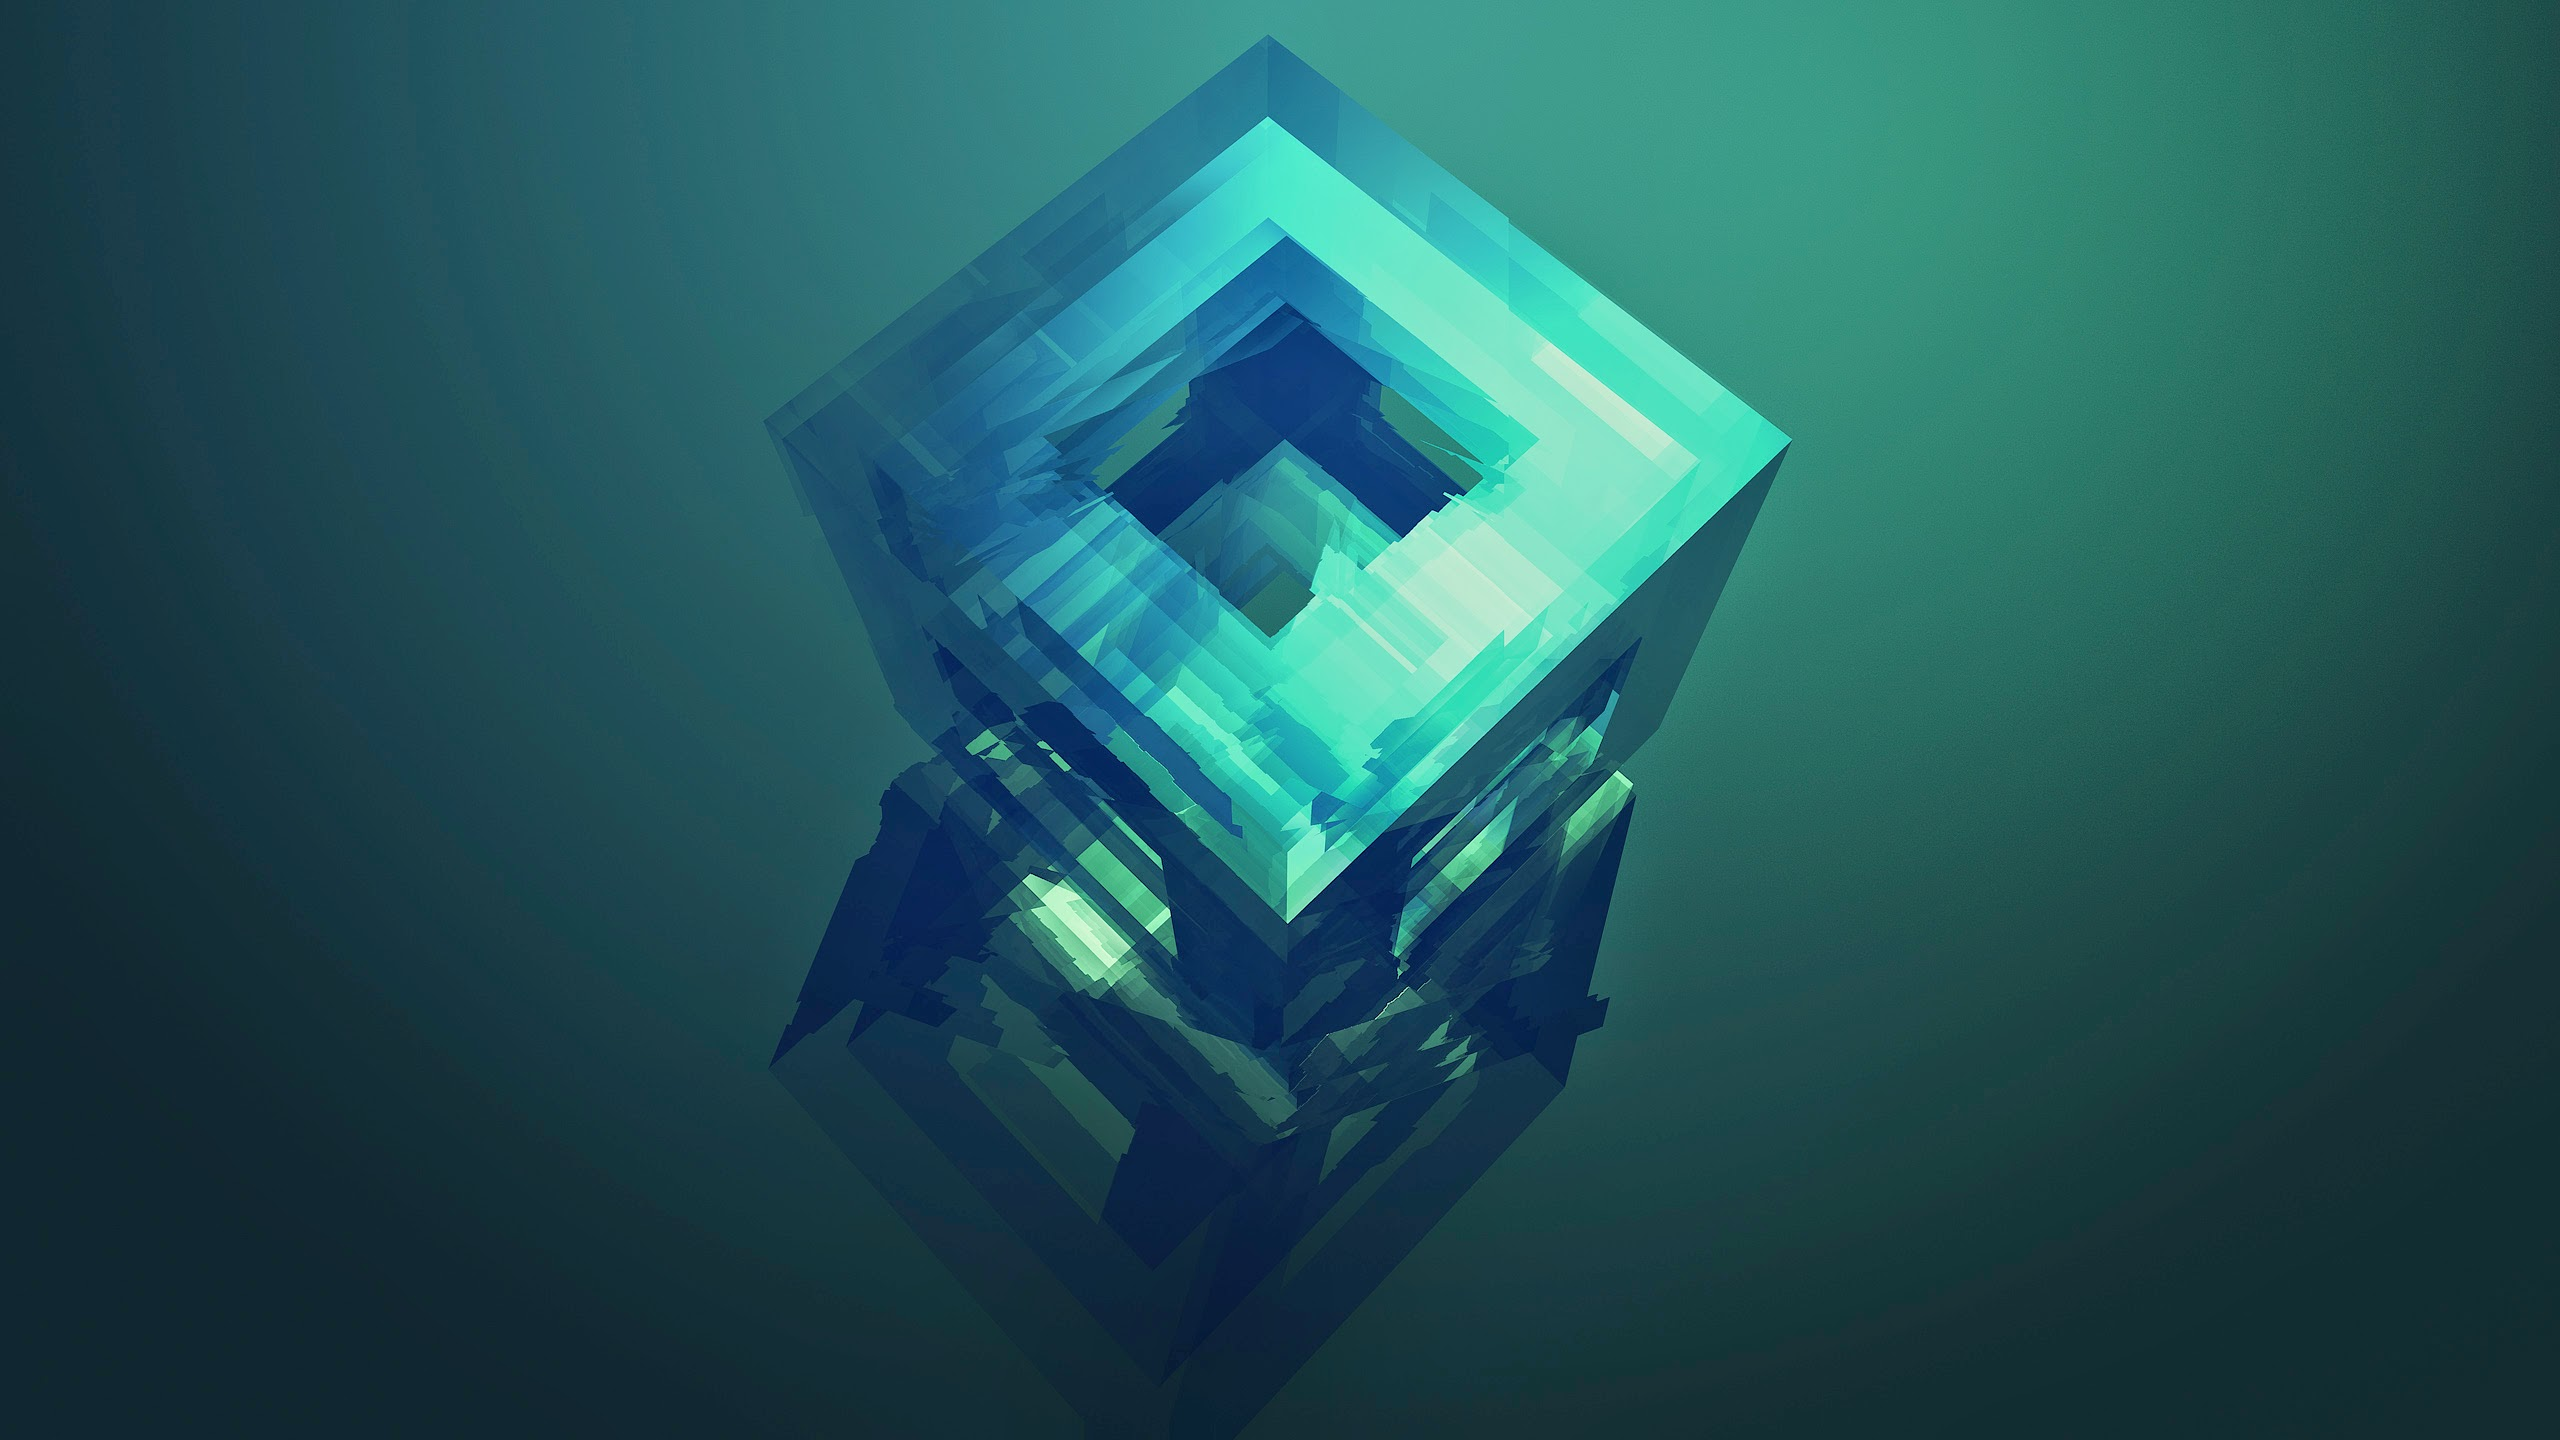 Minimalist Wallpaper Fall Free Download 1440p Images Pixelstalk Net